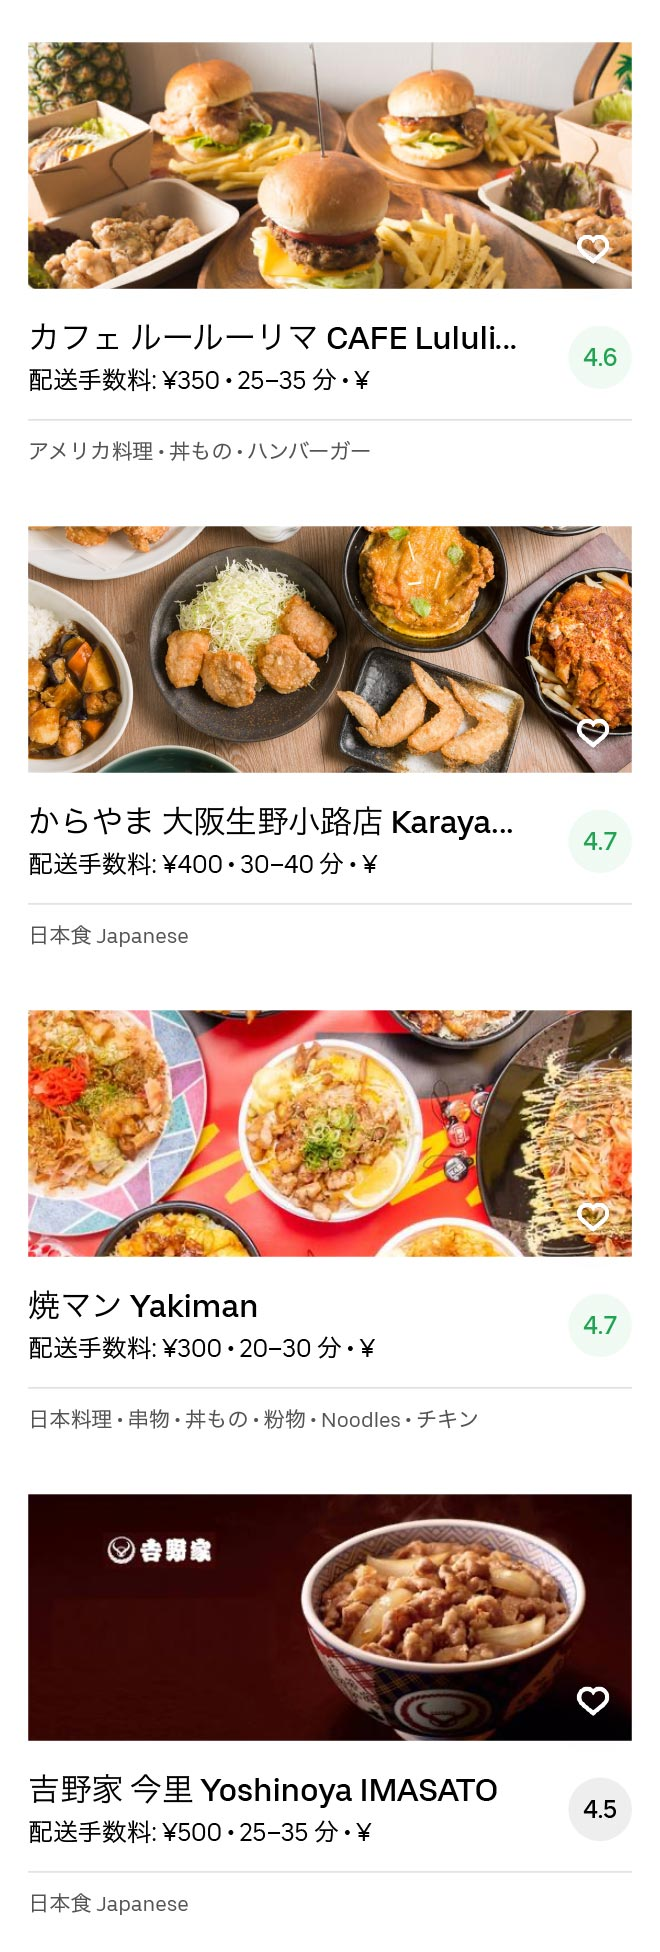 Higashi osaka nagata menu 2005 04